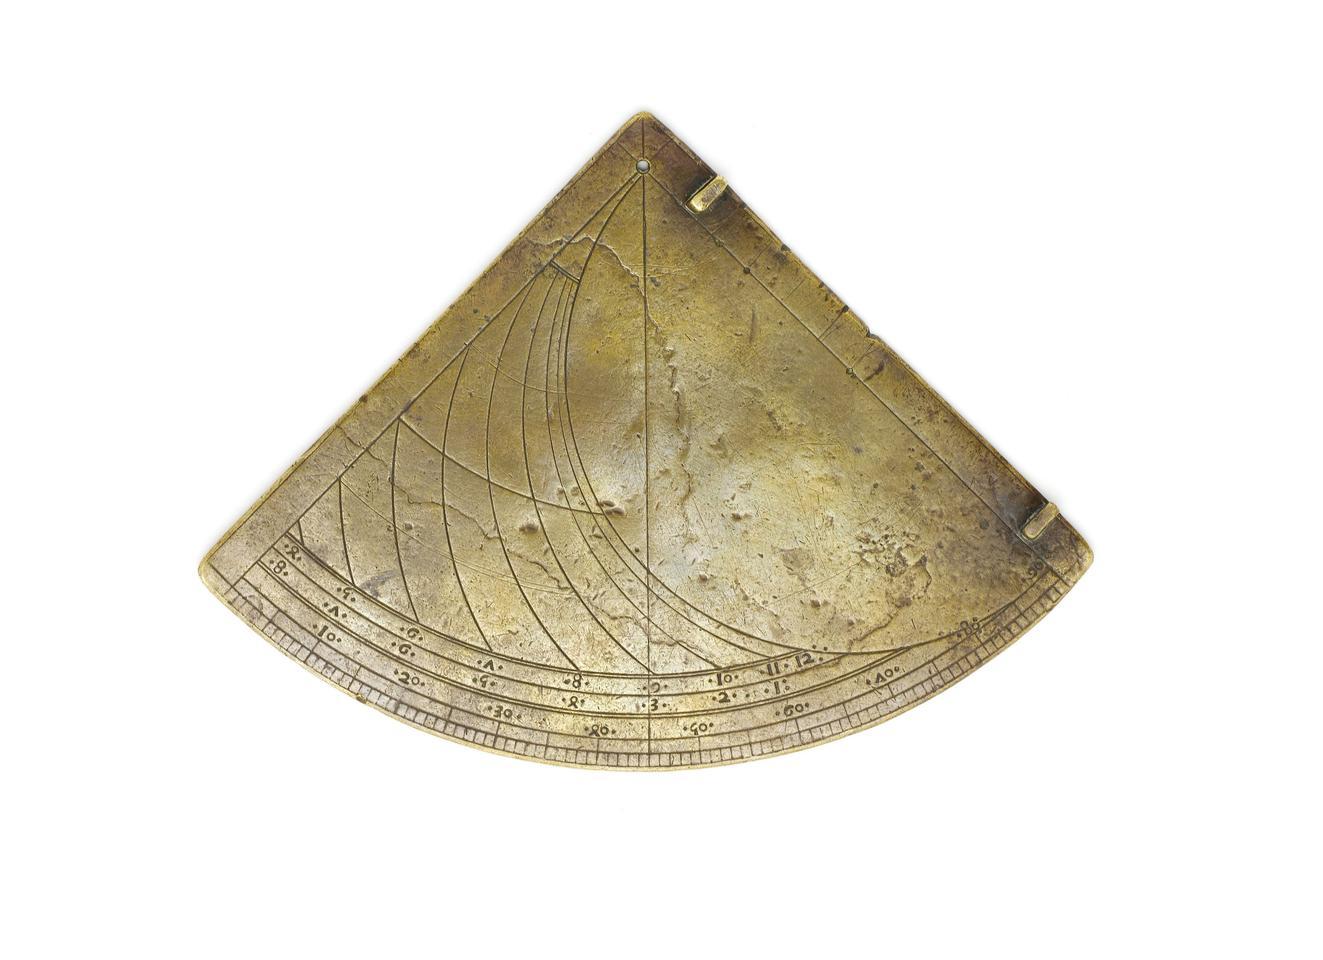 1396 Richard II horary quadrant